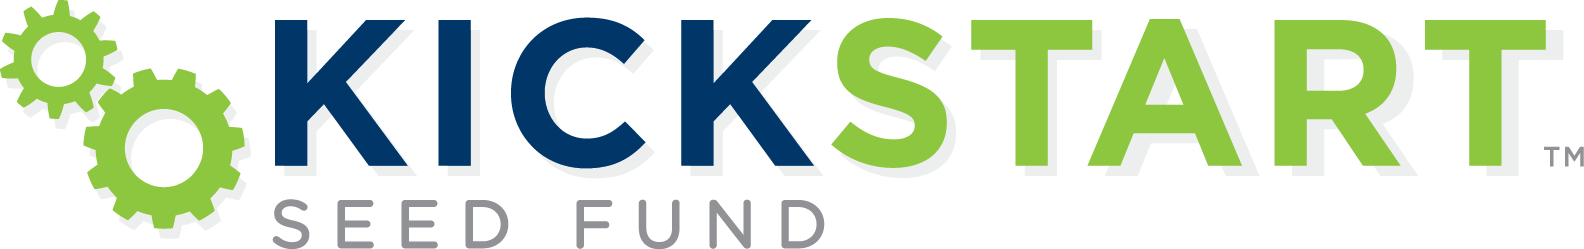 Kickstart Seed Fund